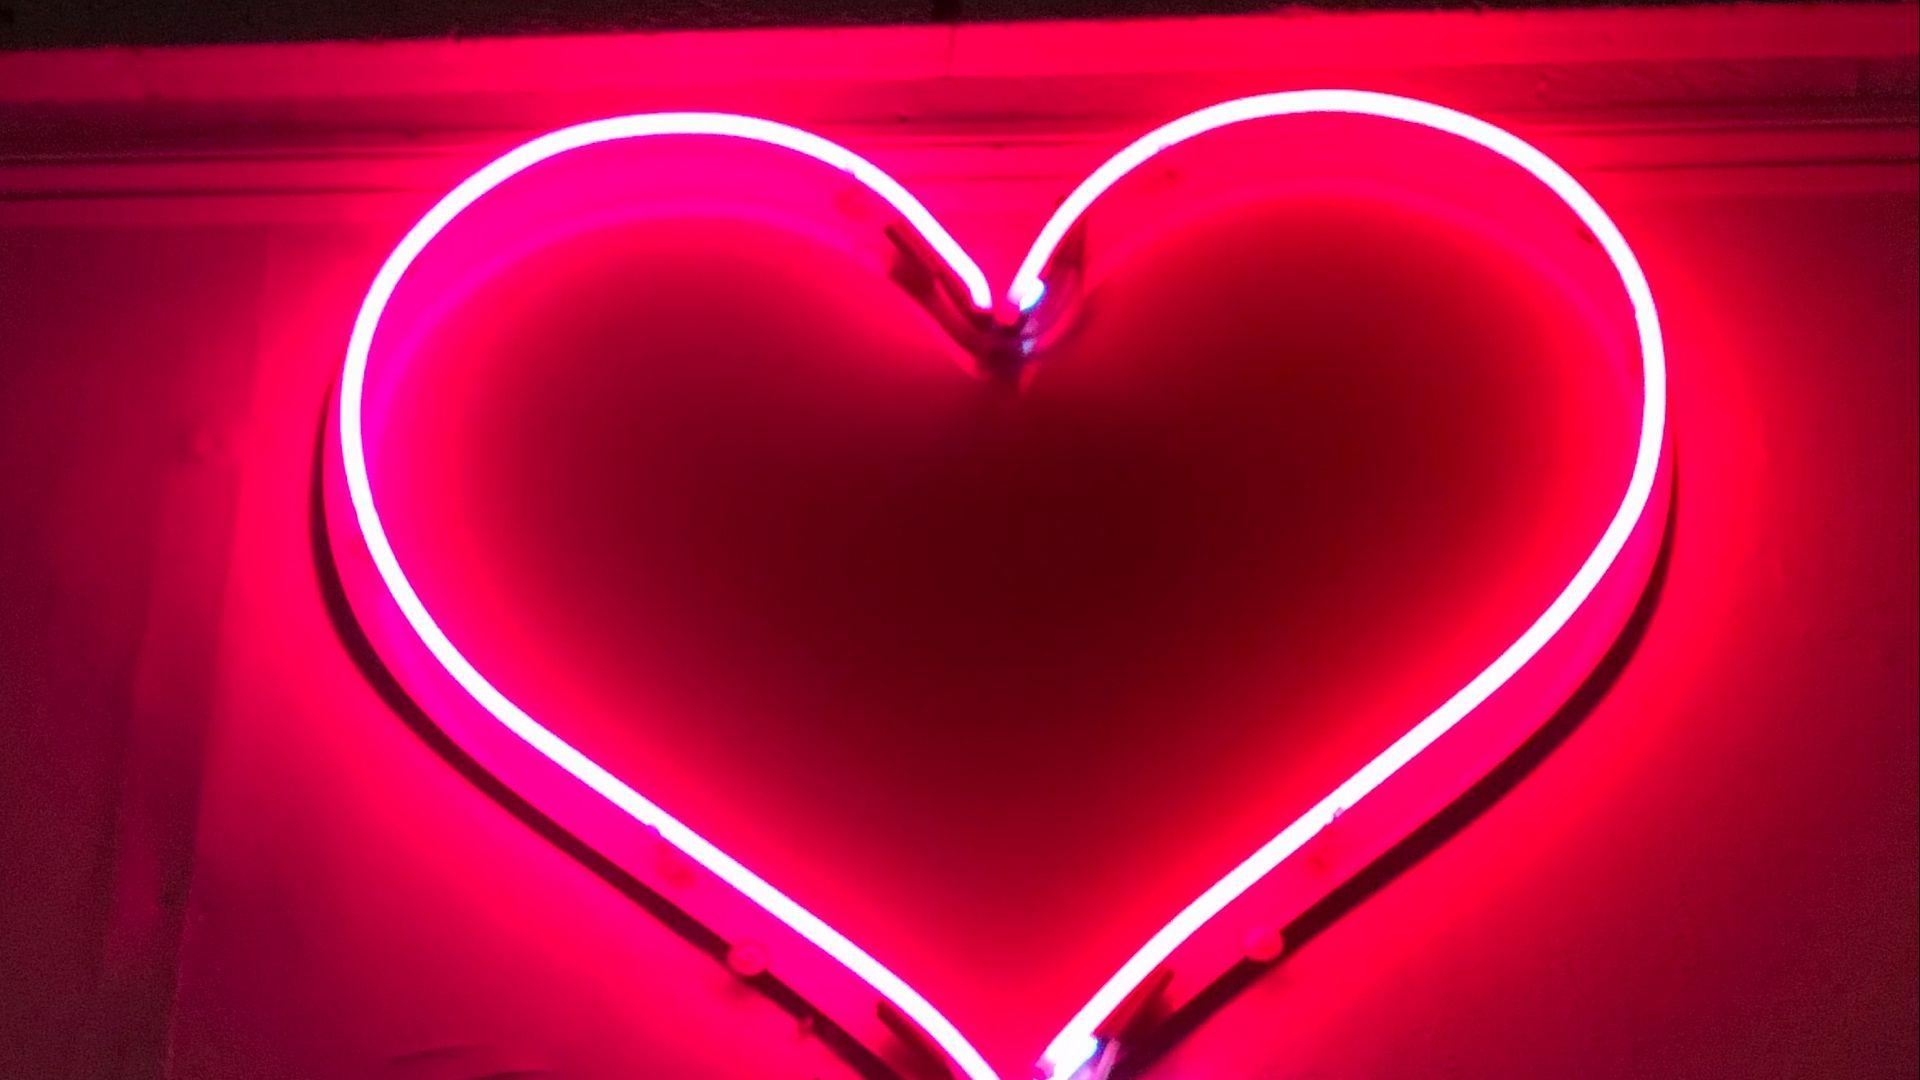 heart love wallpaper